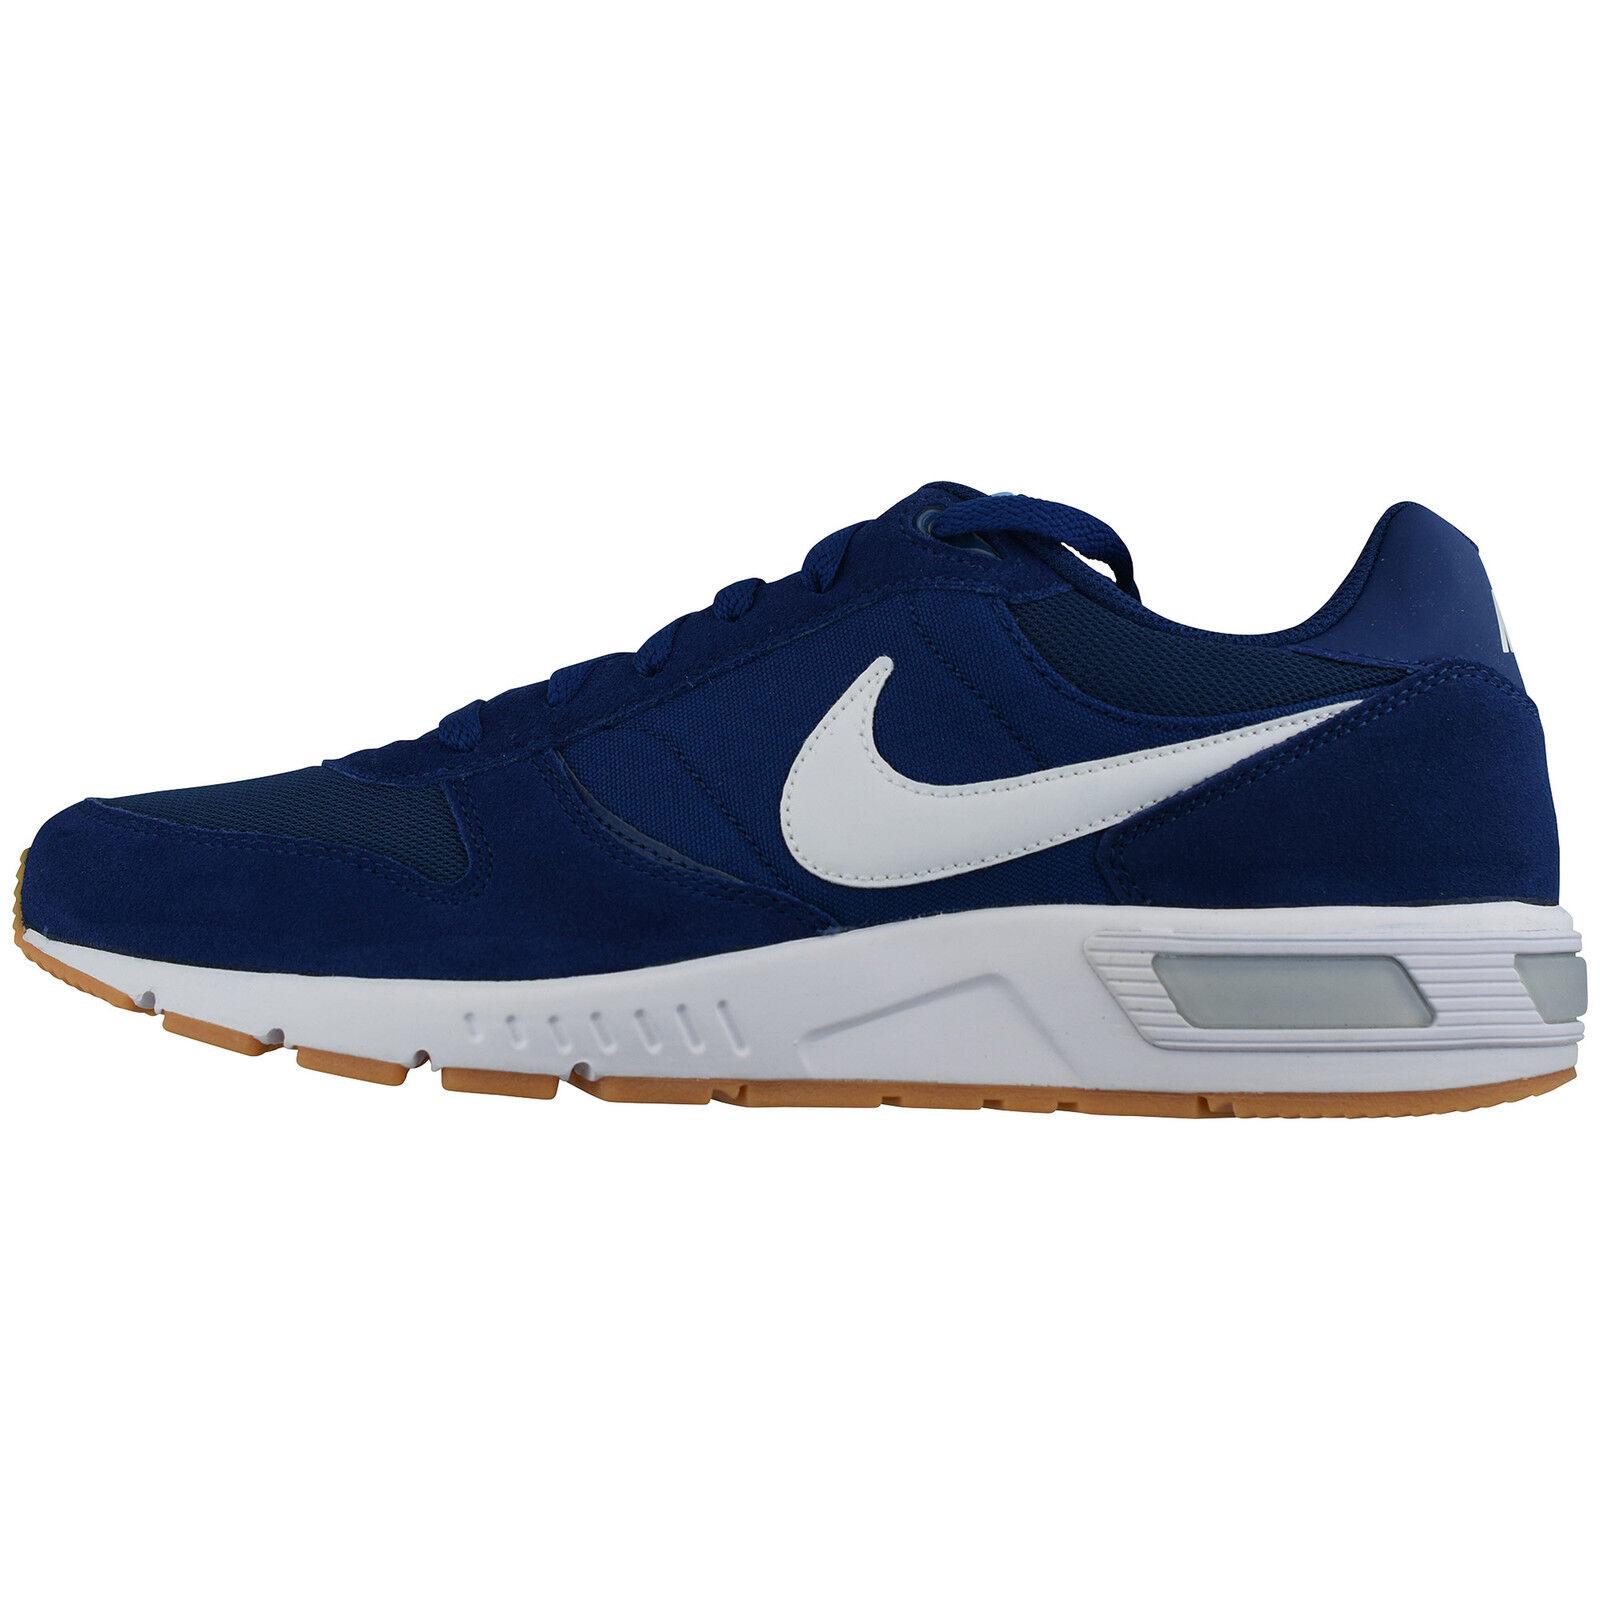 low priced 6c5b9 e7344 NIKE NIKE NIKE Nightgazer 644402-412 Classic Tempo Libero Lifestyle Sneaker  Scarpa c7893f